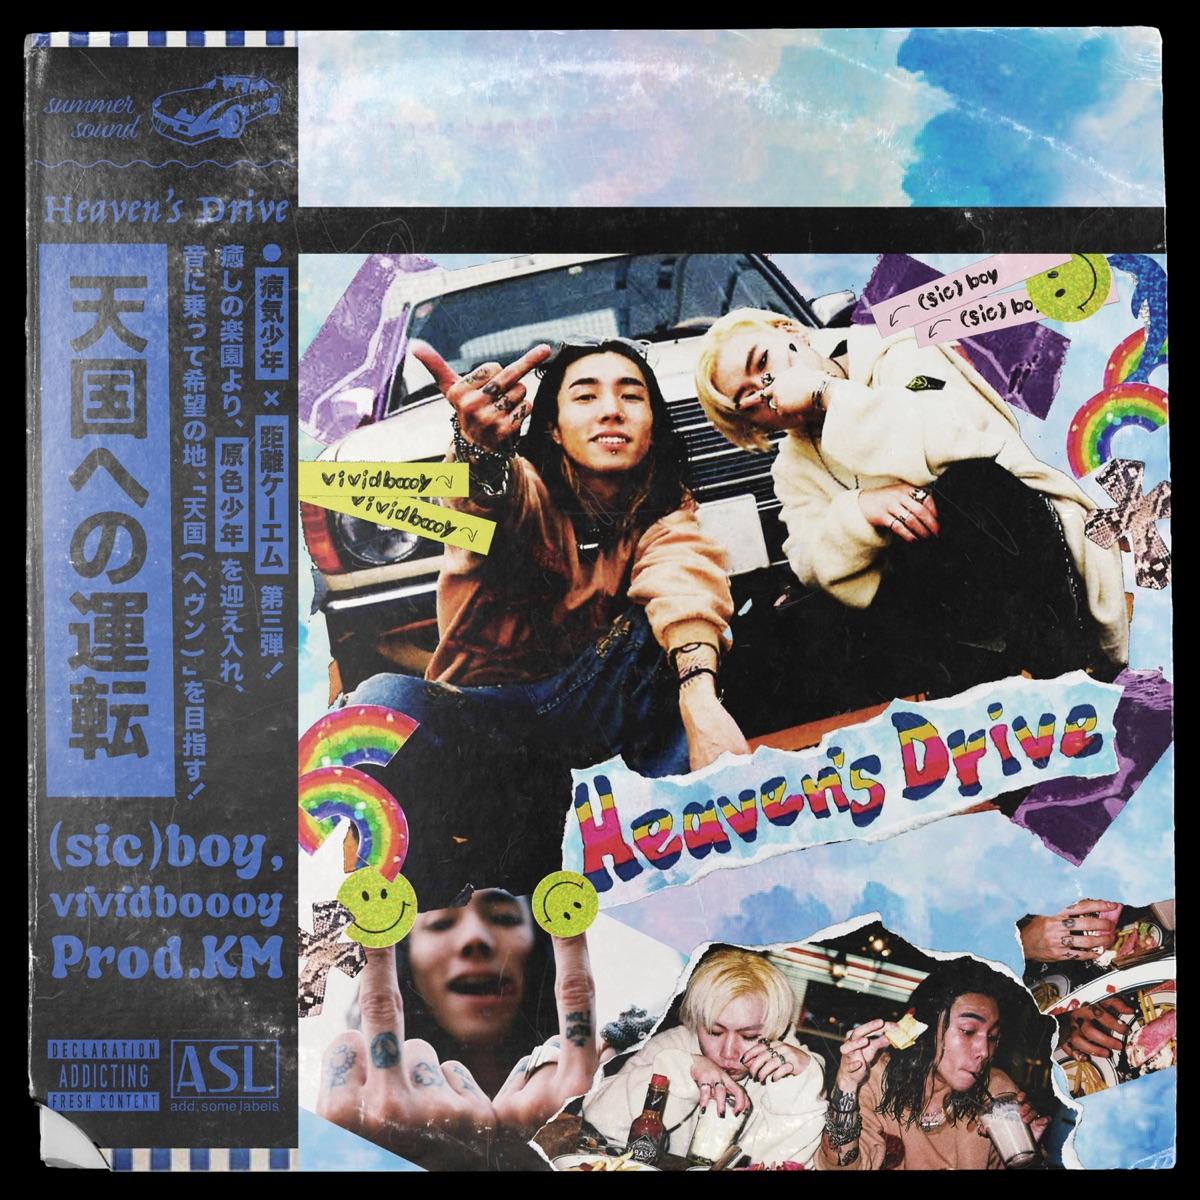 『(sic)boy,KM - Heaven's Drive feat. vividboooy』収録の『Heaven's Drive feat. vividboooy』ジャケット